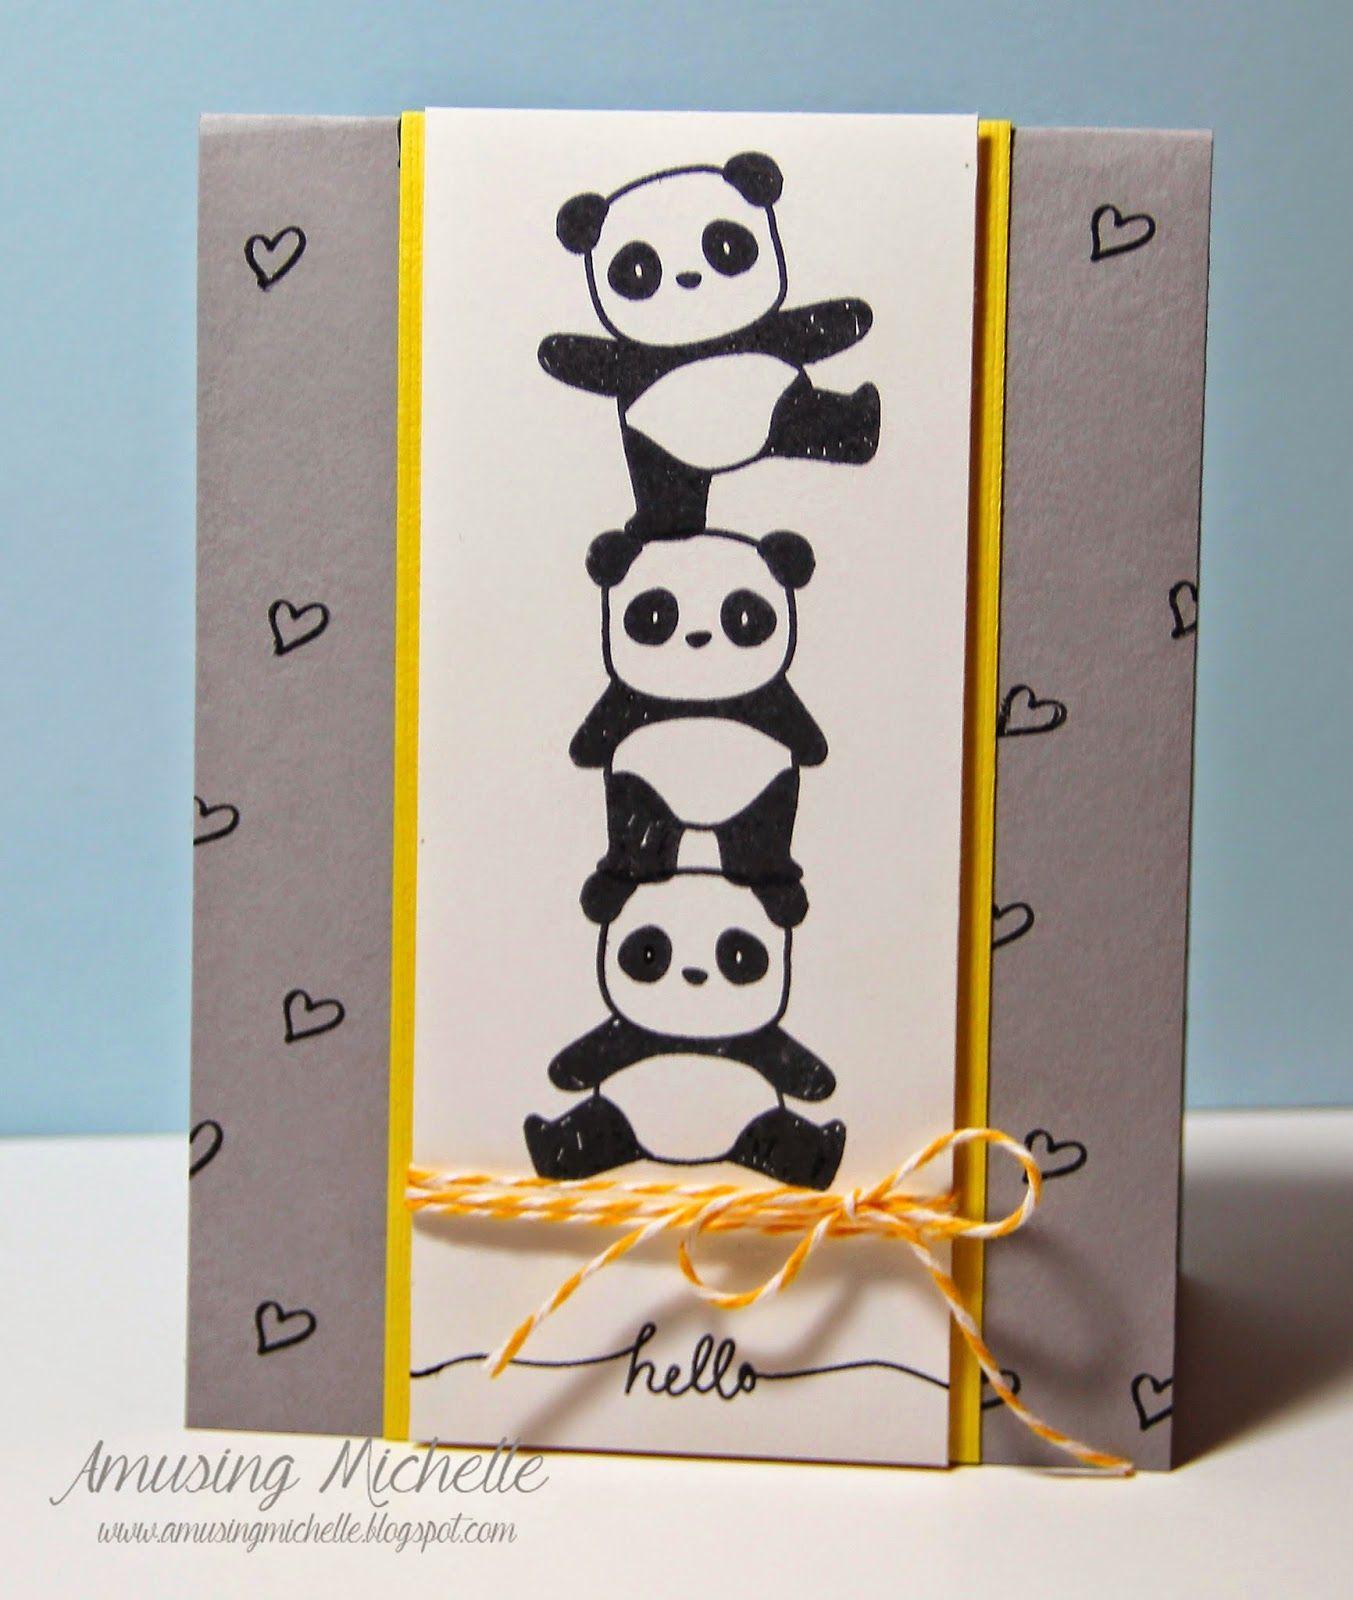 Amusing Michelle Fusion Acrobat Pandas Card Inspiration